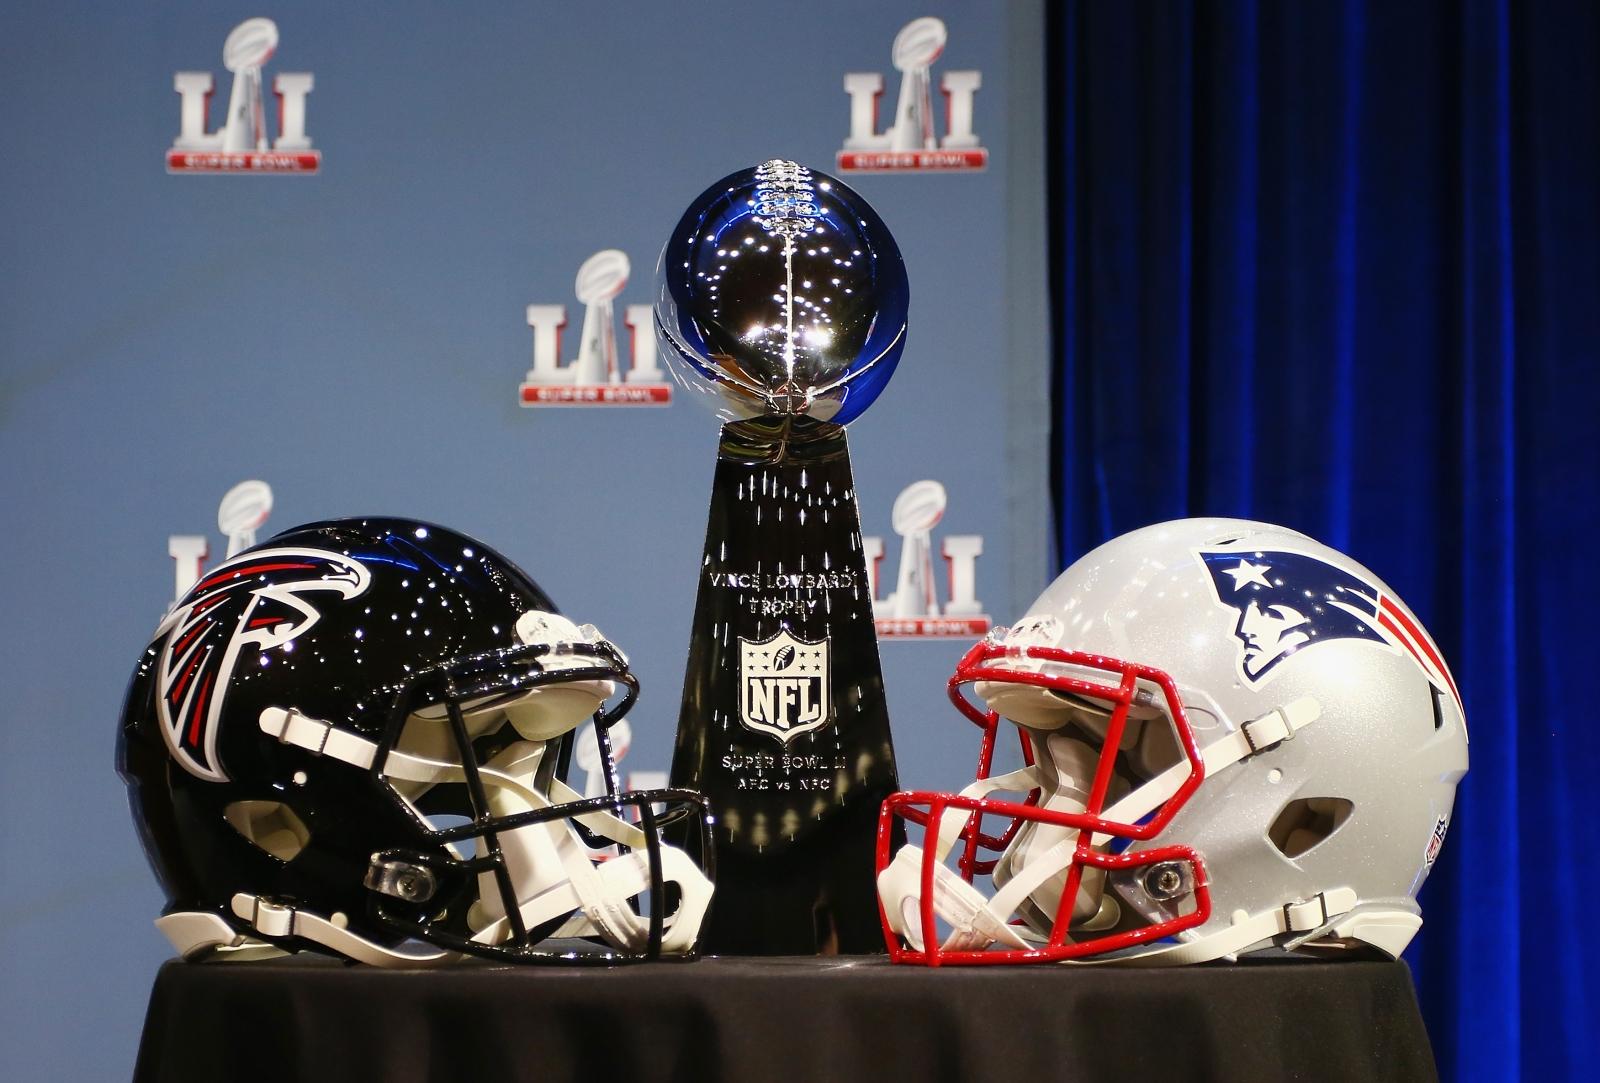 Who Will Win Super Bowl 51 Experts Predict New England Patriots Vs Atl...